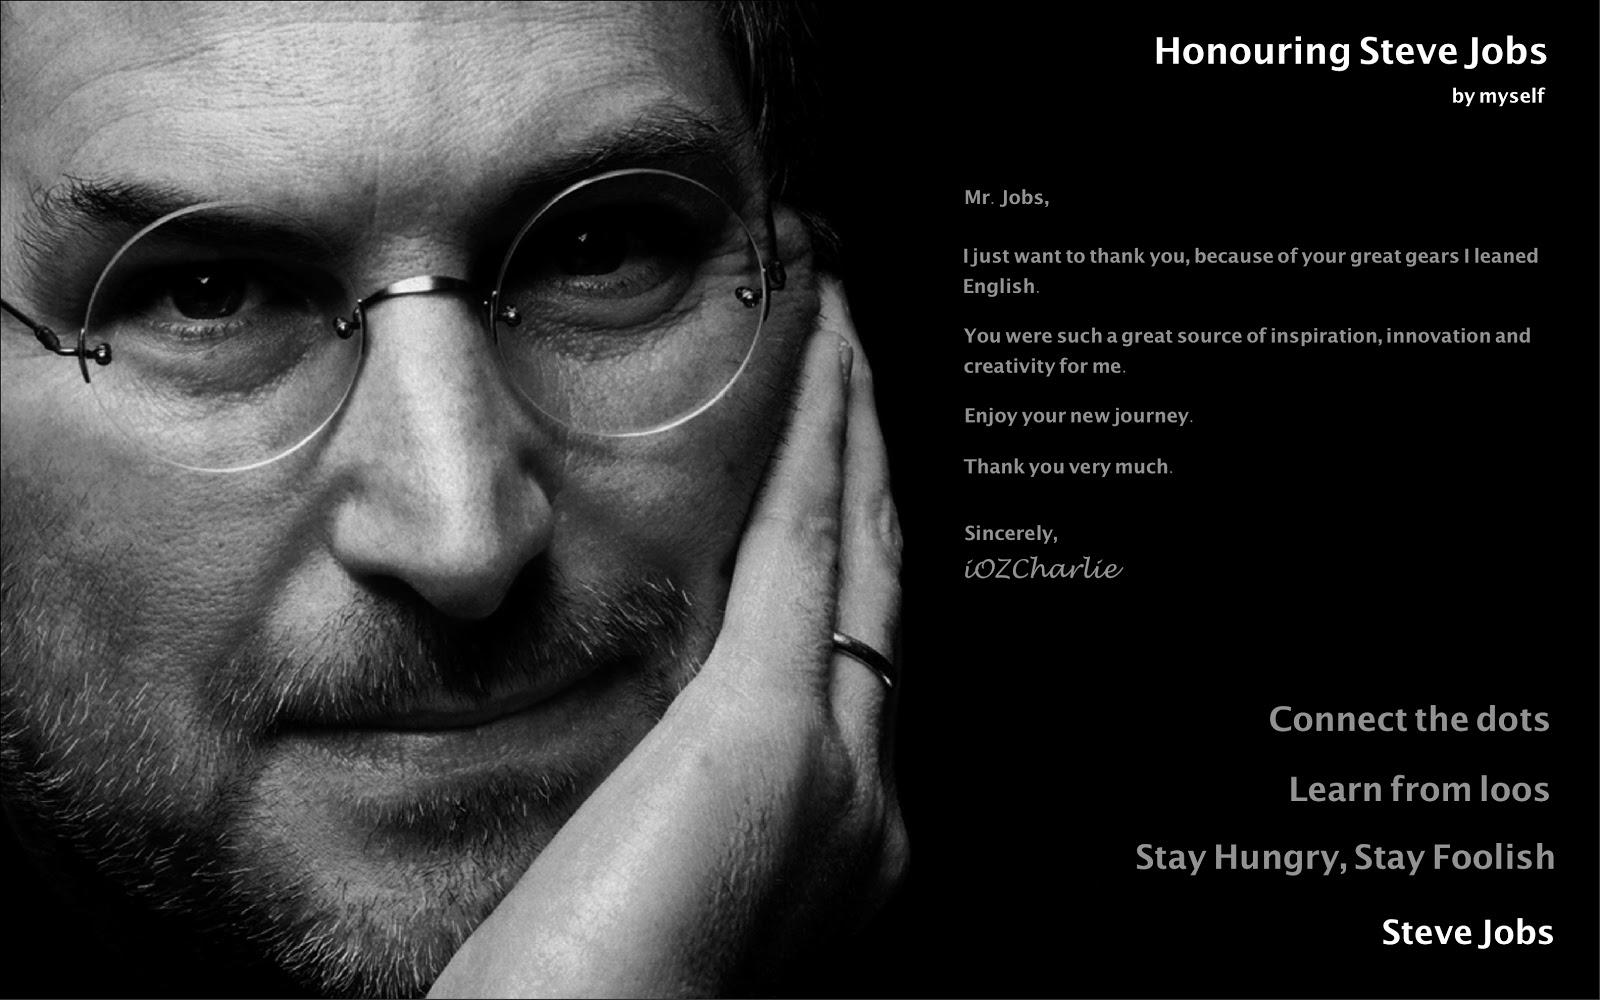 http://4.bp.blogspot.com/-ol9UBG4f-fw/To02z3c7qhI/AAAAAAAABb8/aYOuFmXOIVw/s1600/honouring-Steve-Jobs.jpg